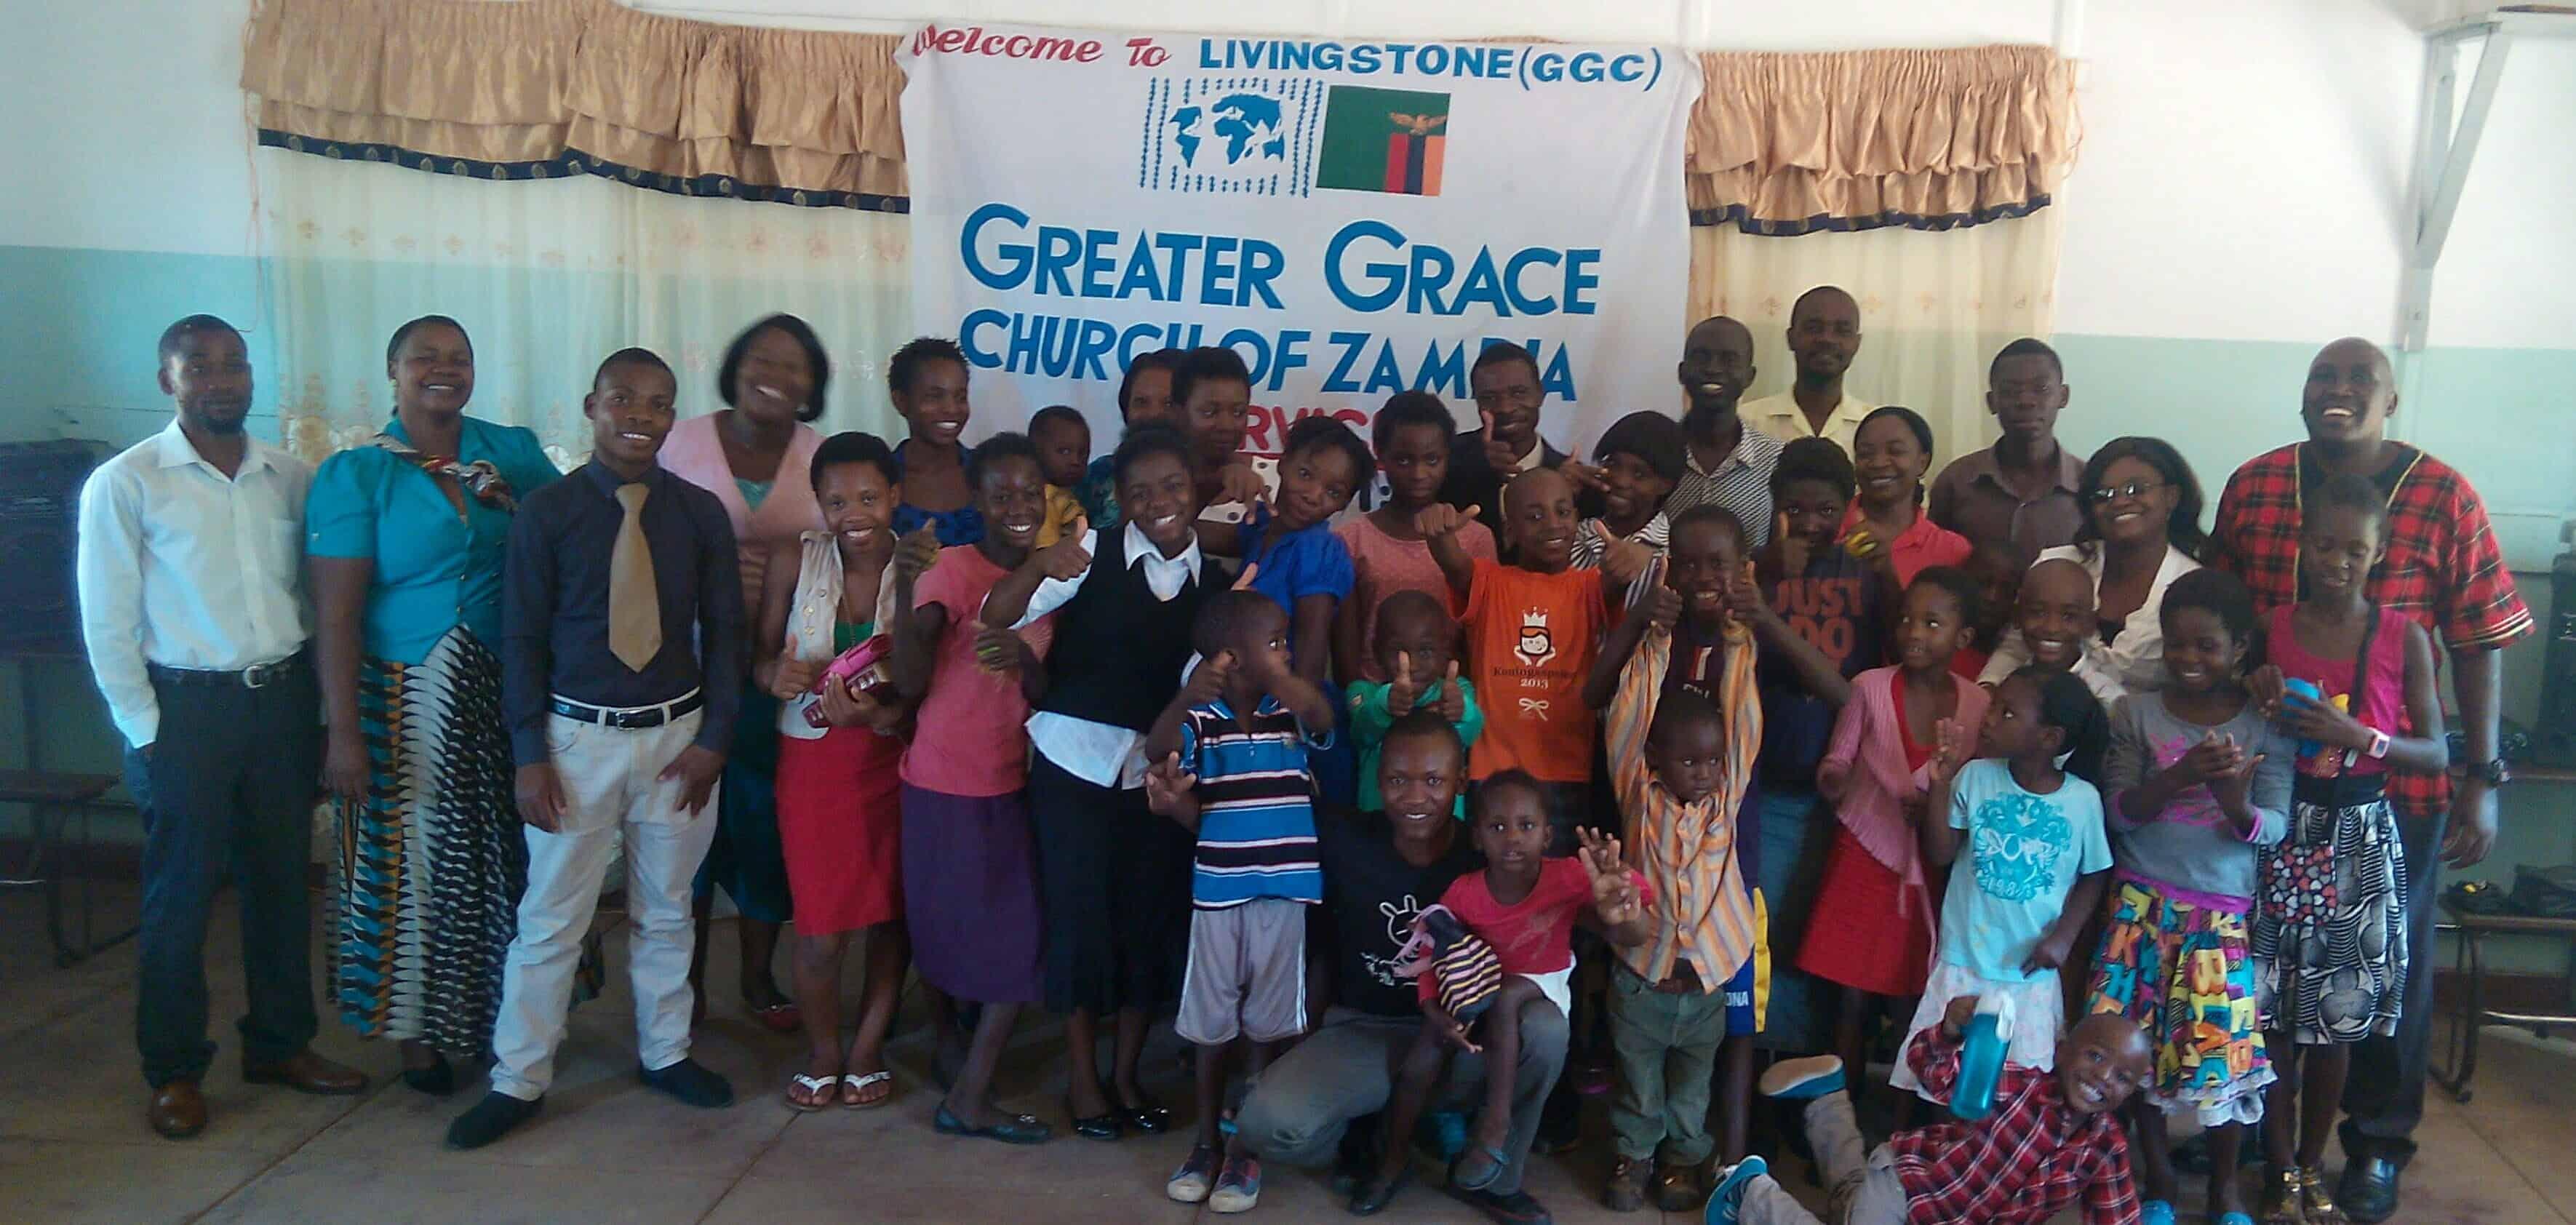 Livingstone.church